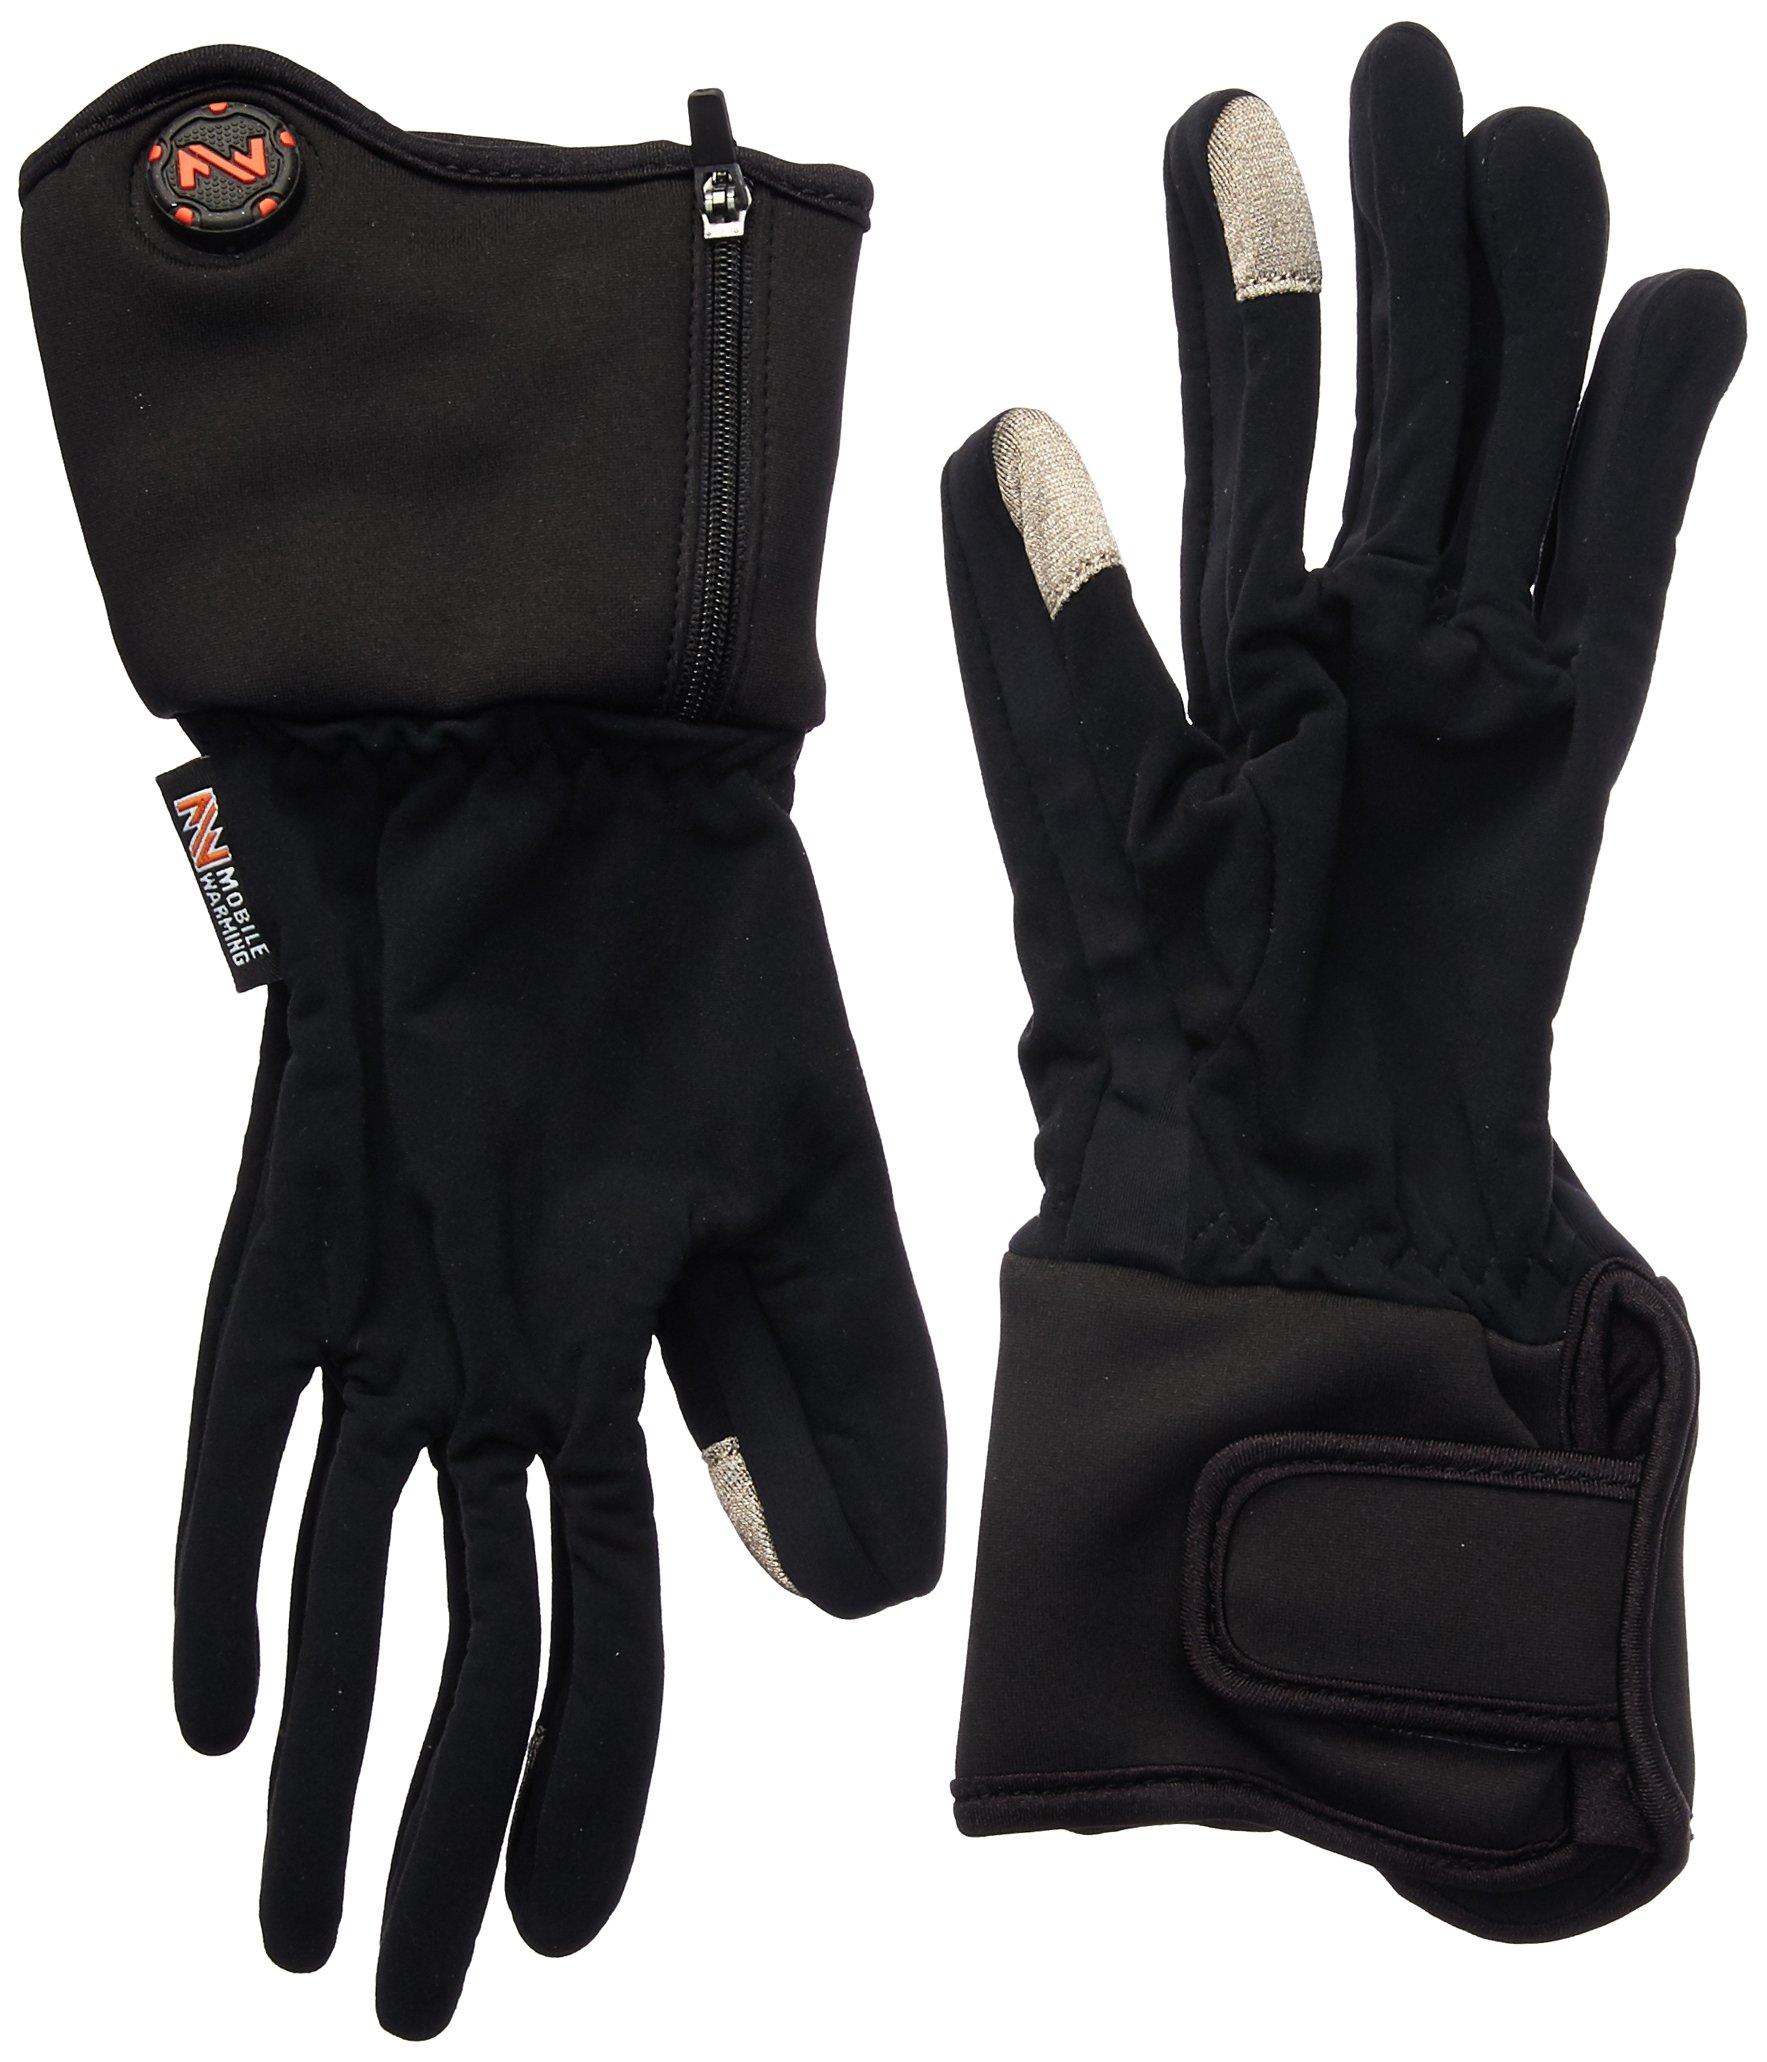 Mobile Warming Unisex-Adult Heated 7.4v Gloves Liner Black Small